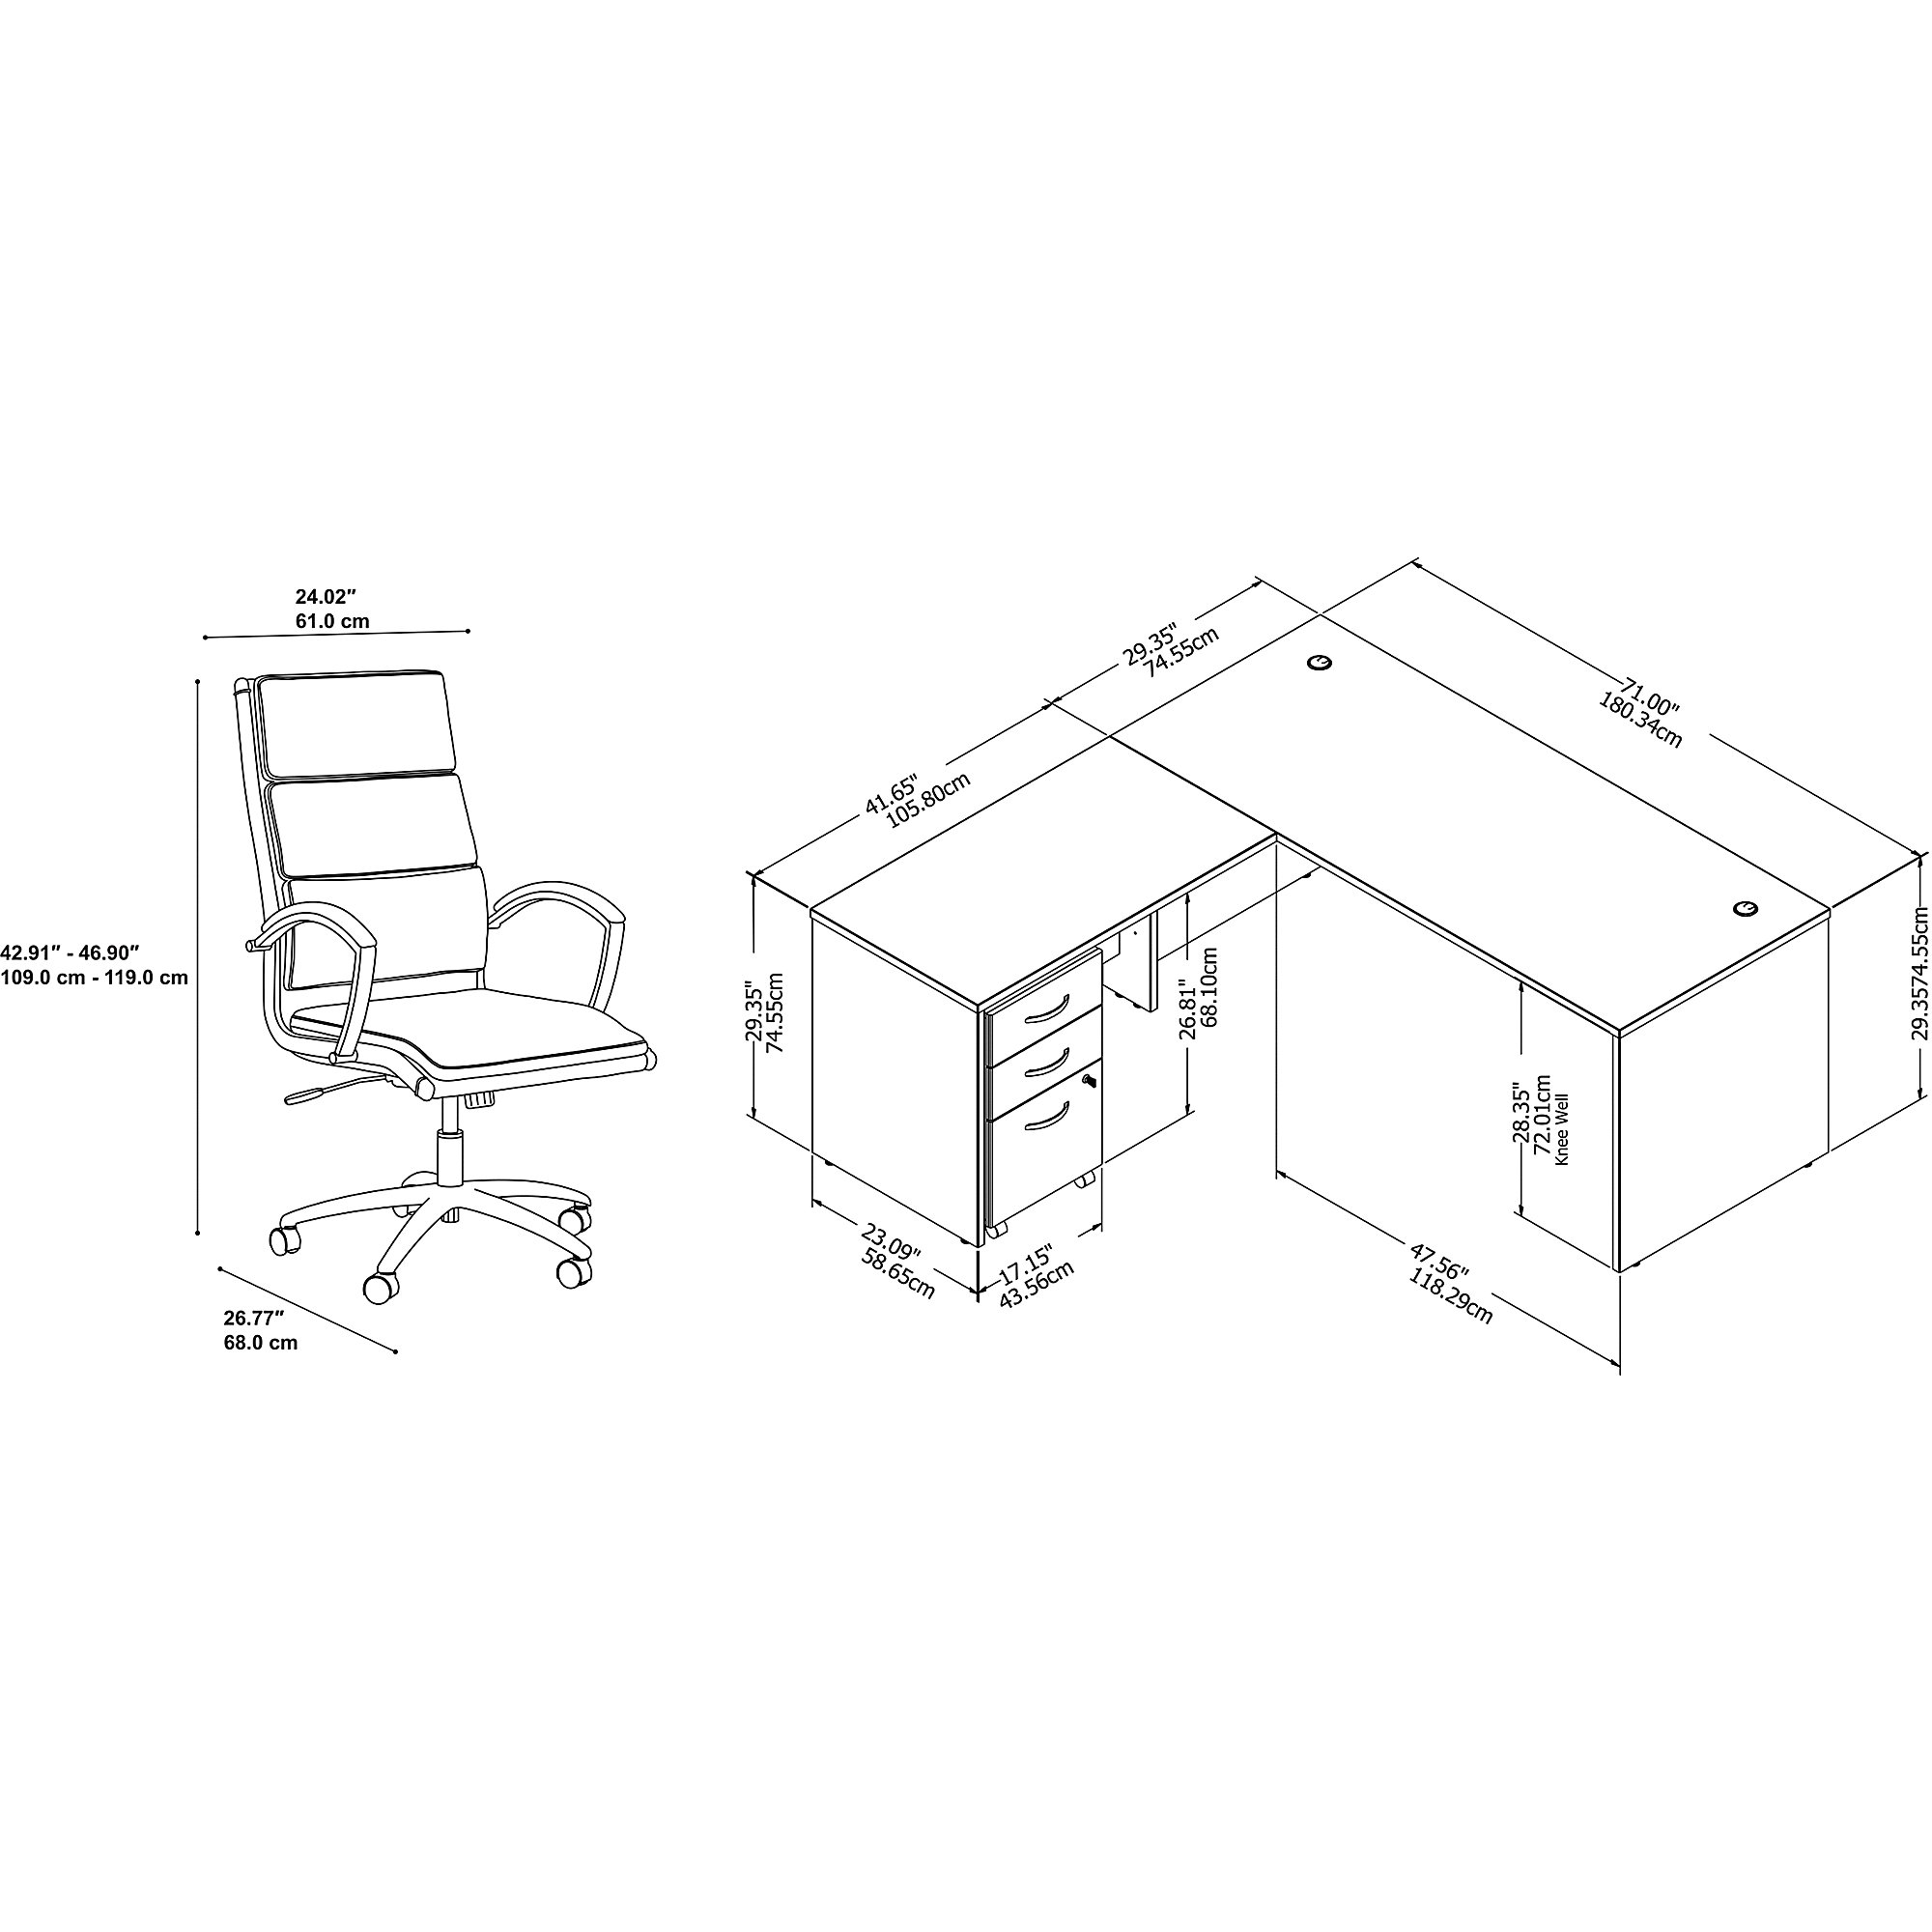 studio c l desk with chair dimensions